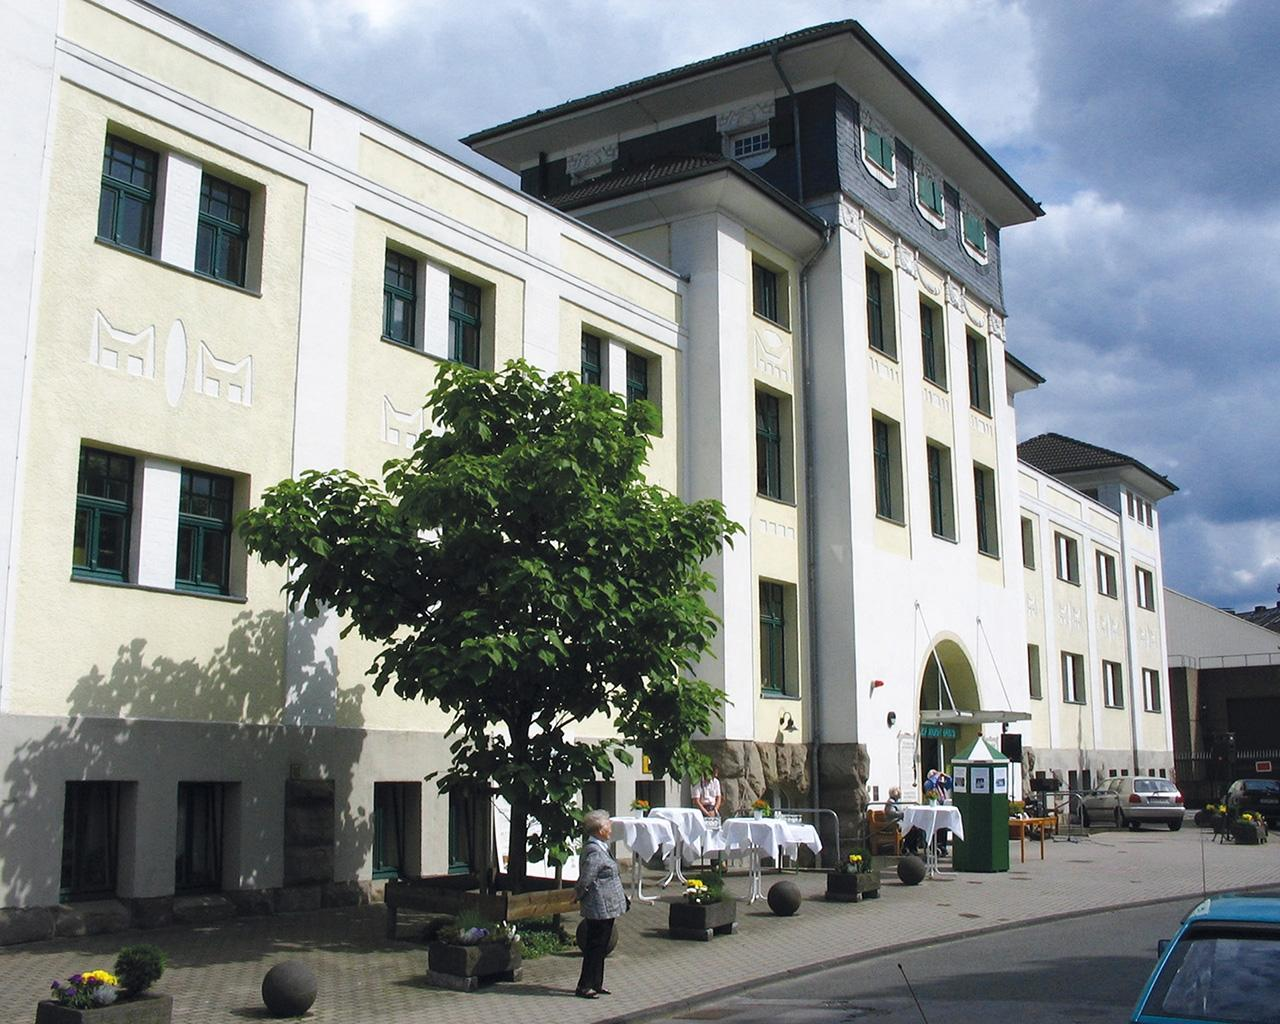 St. LAZARUS -Haus Wuppertal